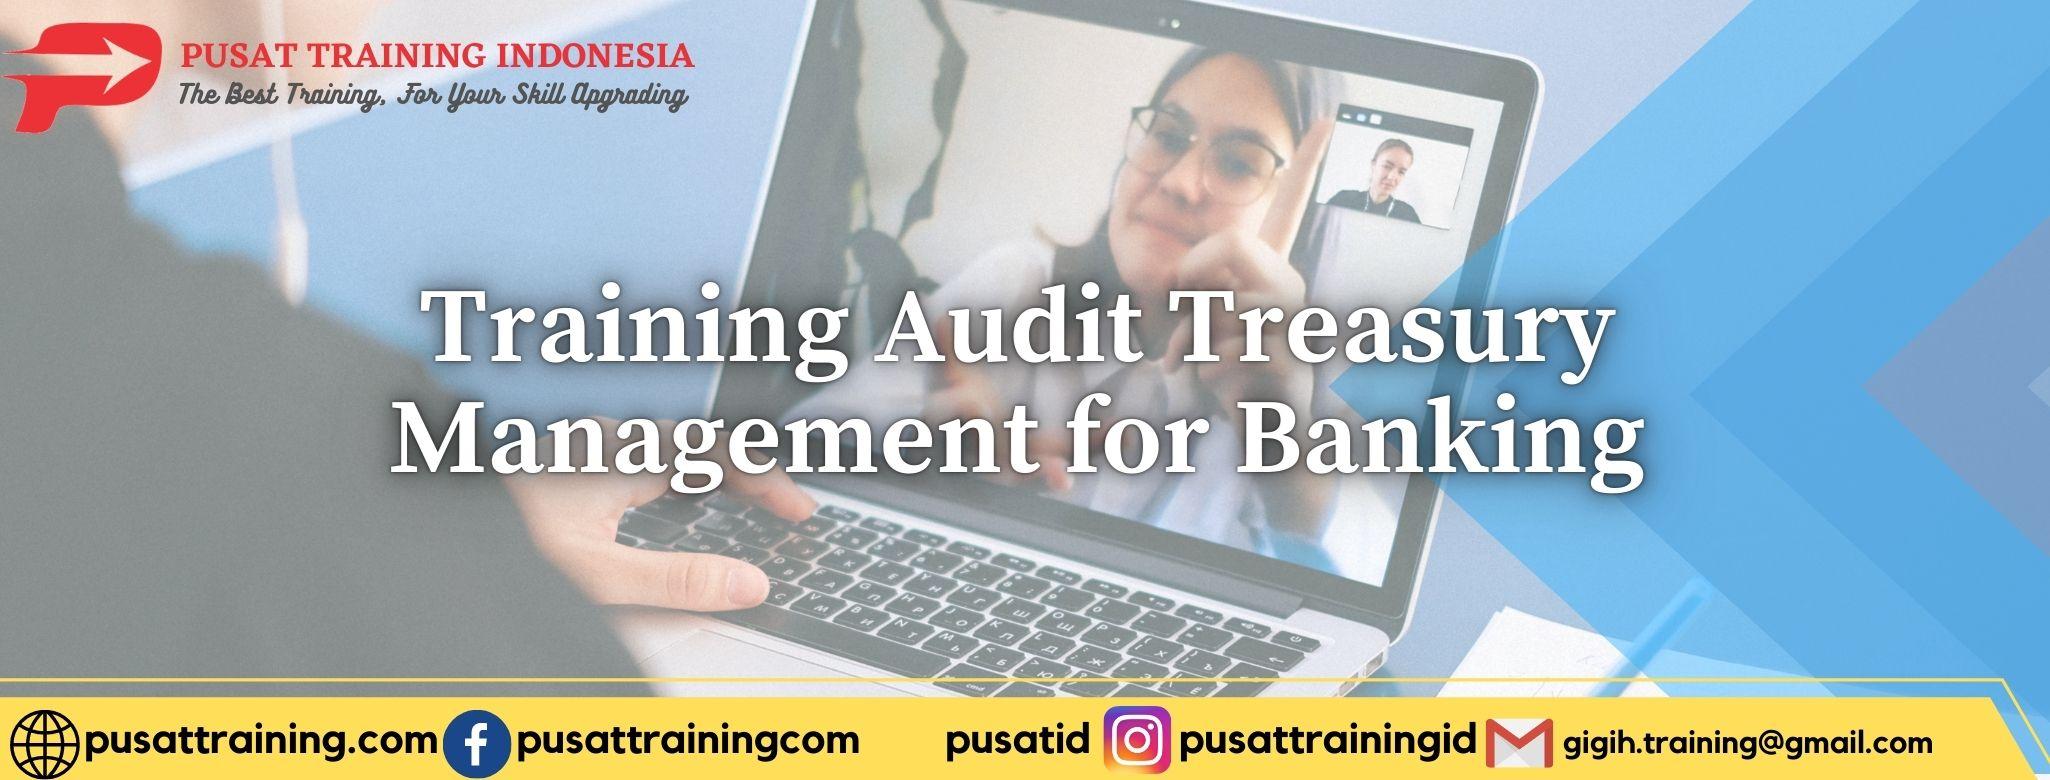 Training-Audit-Treasury-Management-for-Banking